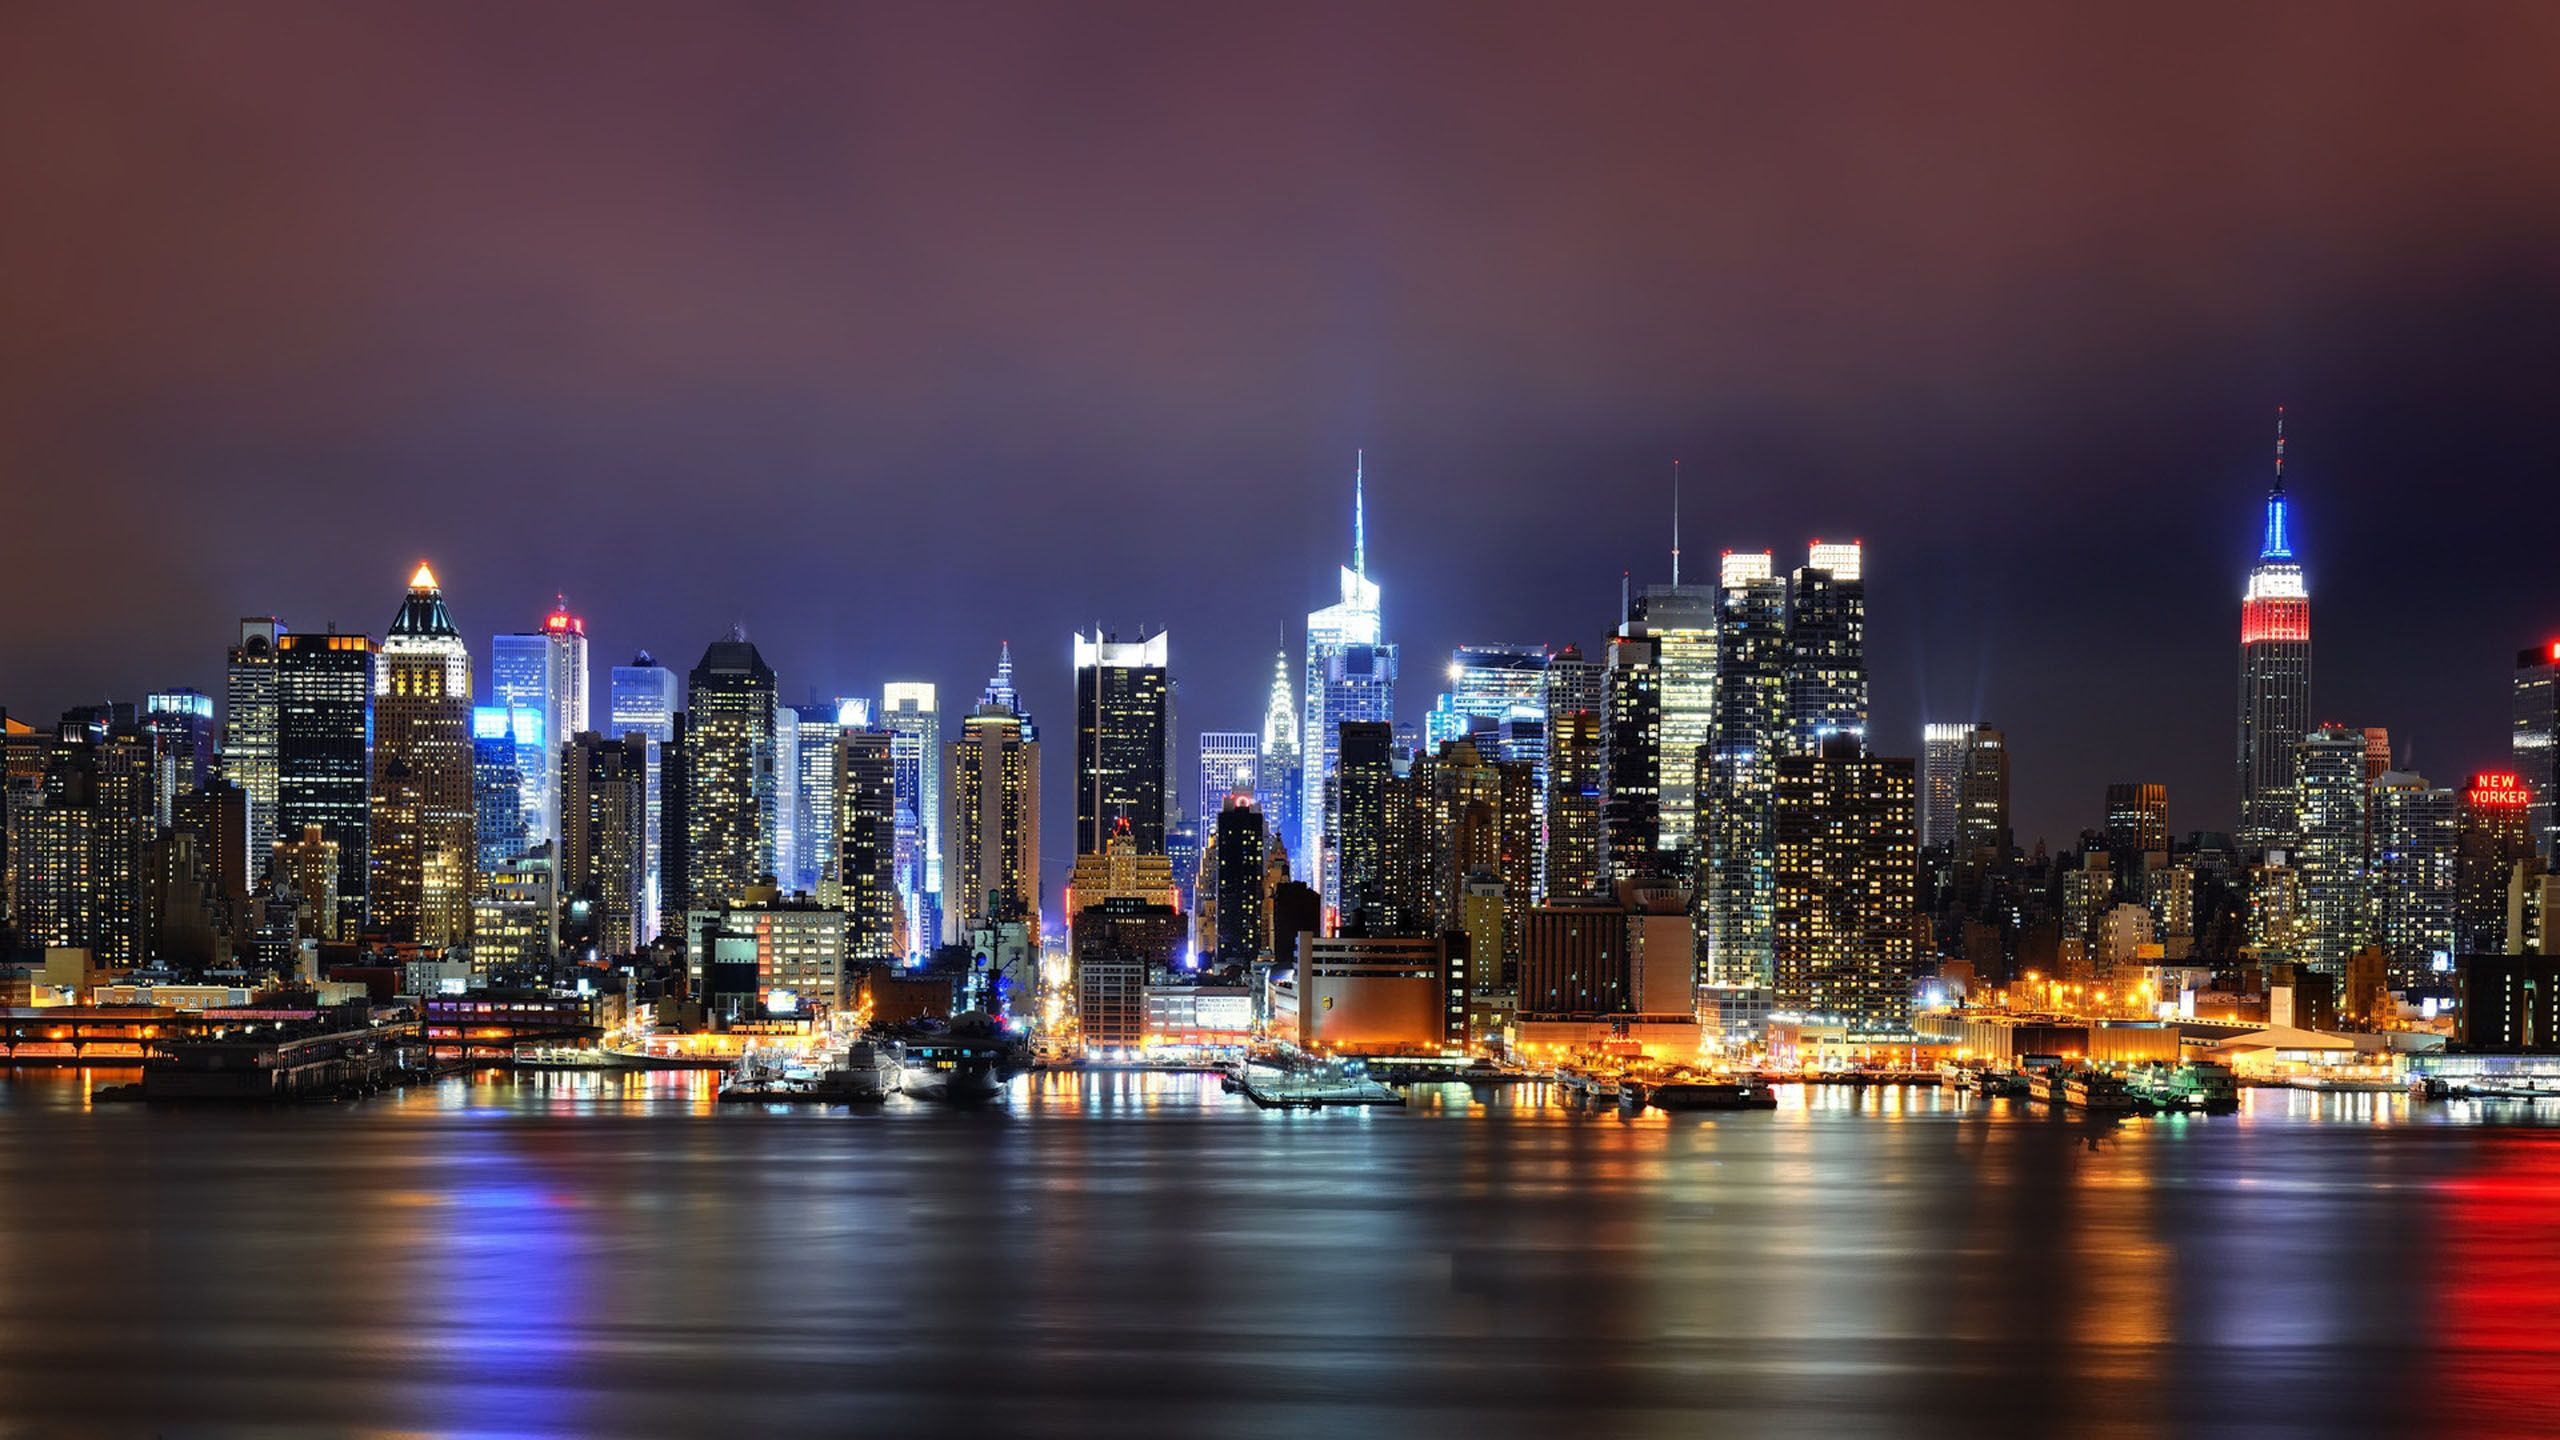 Nyc Skyline At Night - Google Search